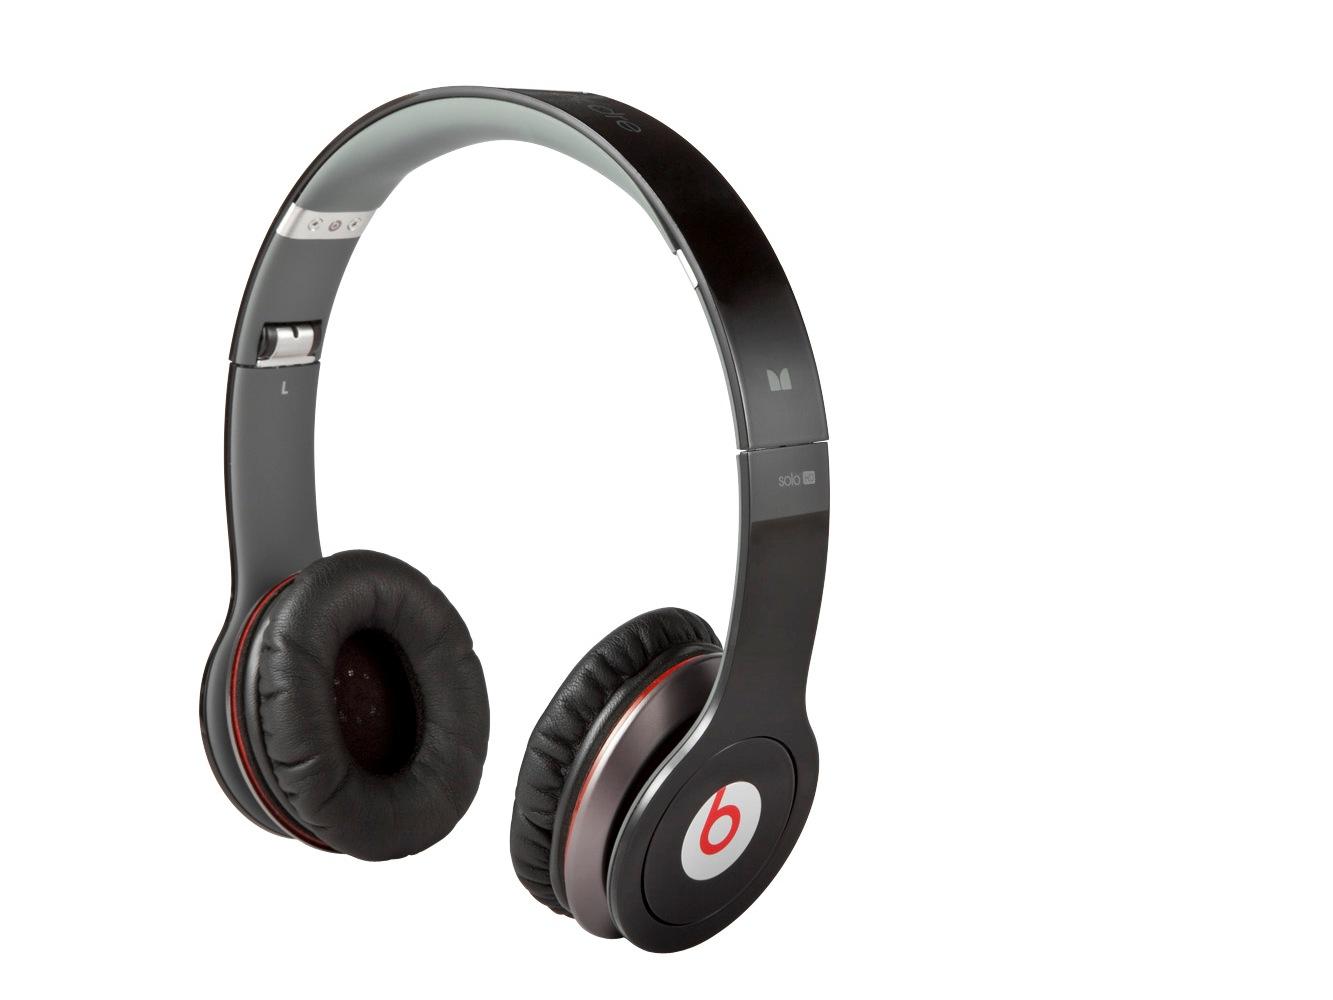 Beats by Dre Solo | TechRadar on joseph audio, aoa audio, rainbow audio, cable audio, aurora audio,